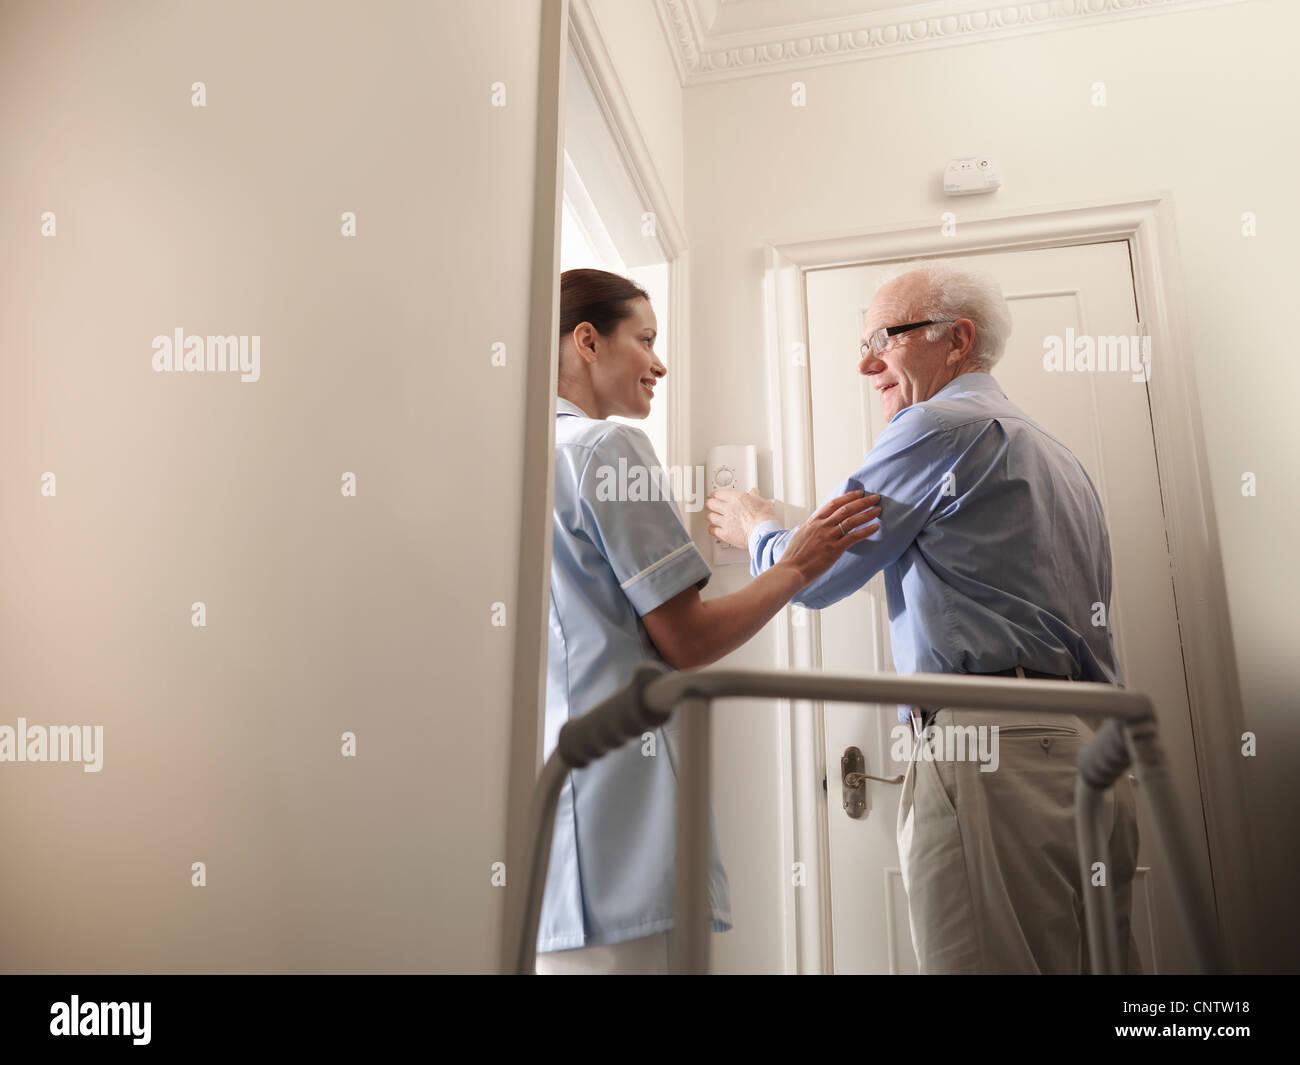 Nurse talking to older man in house - Stock Image